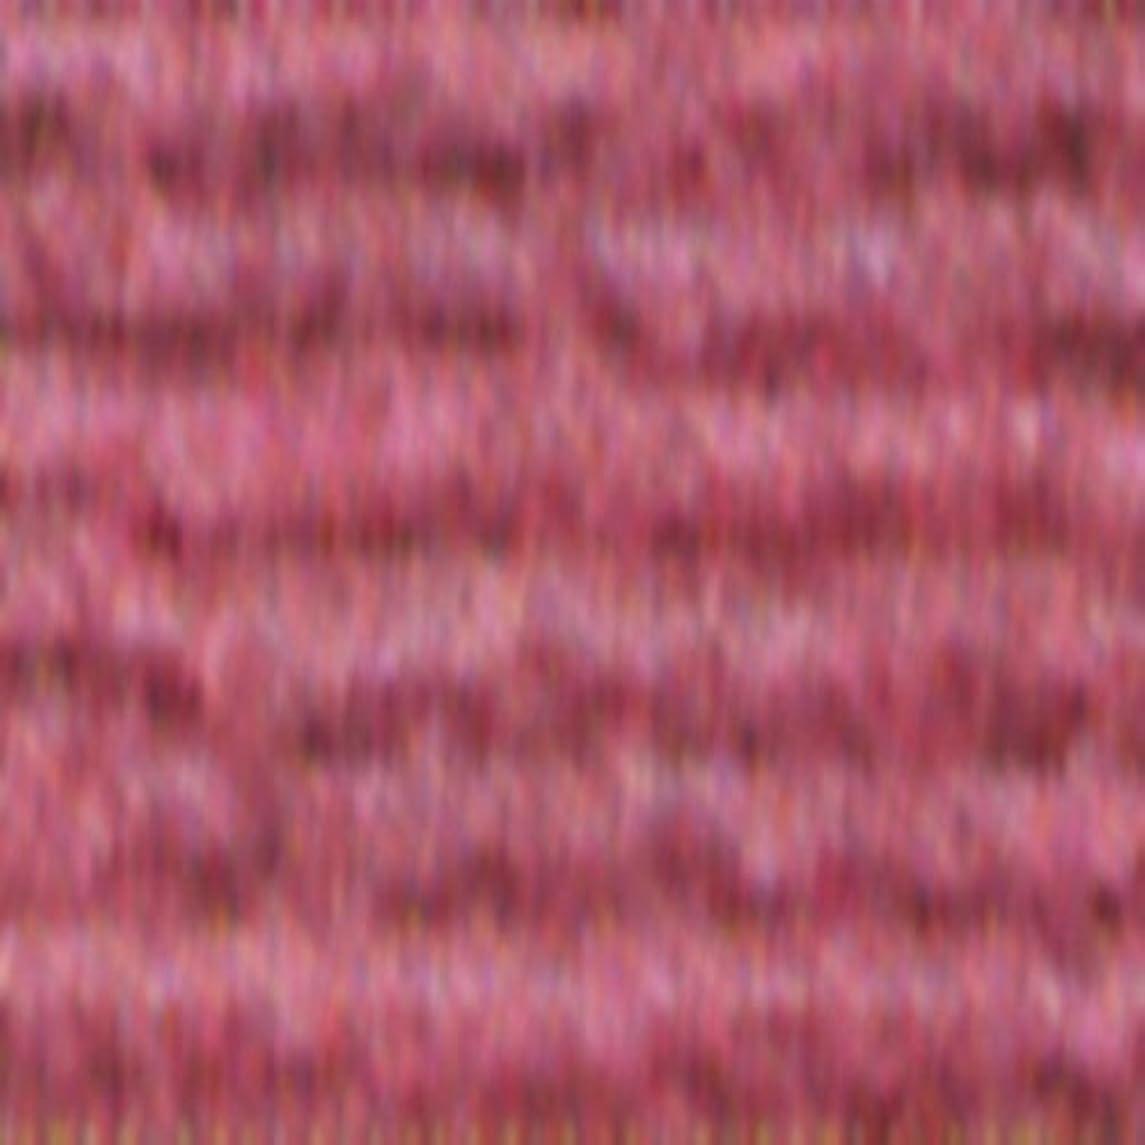 Sullivans Six Strand Embroidery Cotton 8.7 Yards-Dark Dusty Rose 12 per Box